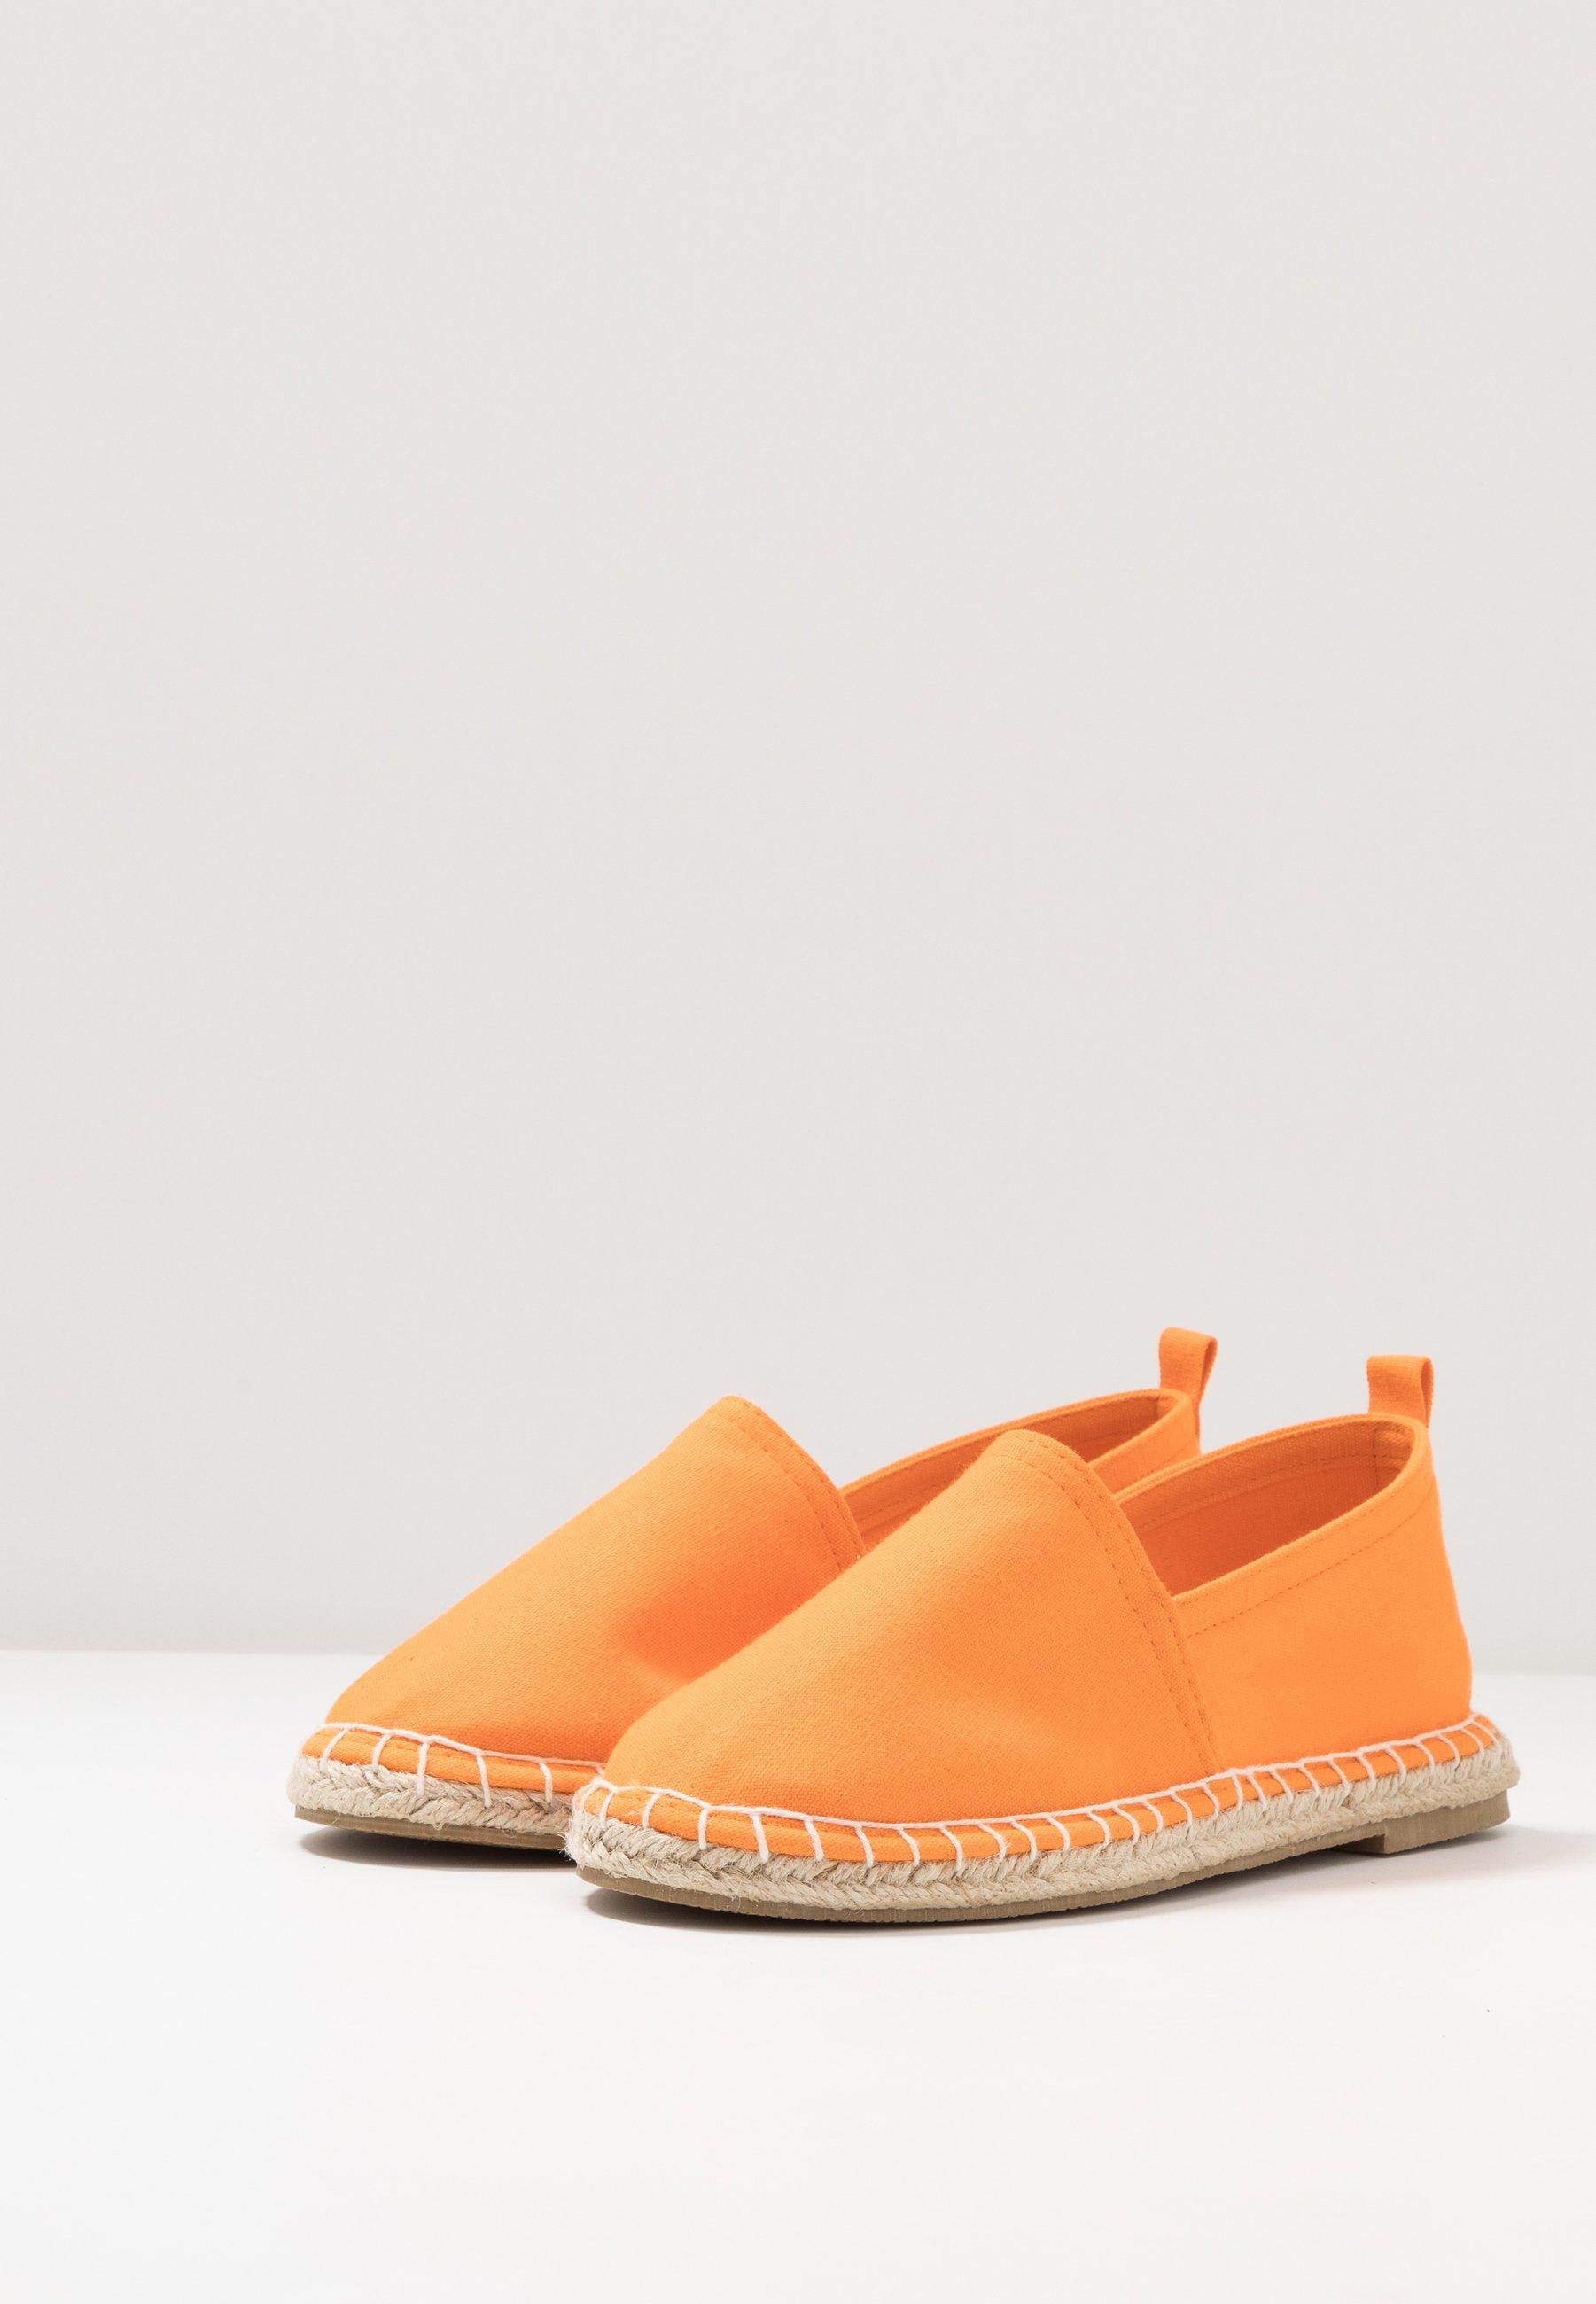 Få Den Nyeste Mode Cut-Pris Damesko Even&Odd 2 PACK  Espadrilles beige/orange BUmLAe wZ8VBK